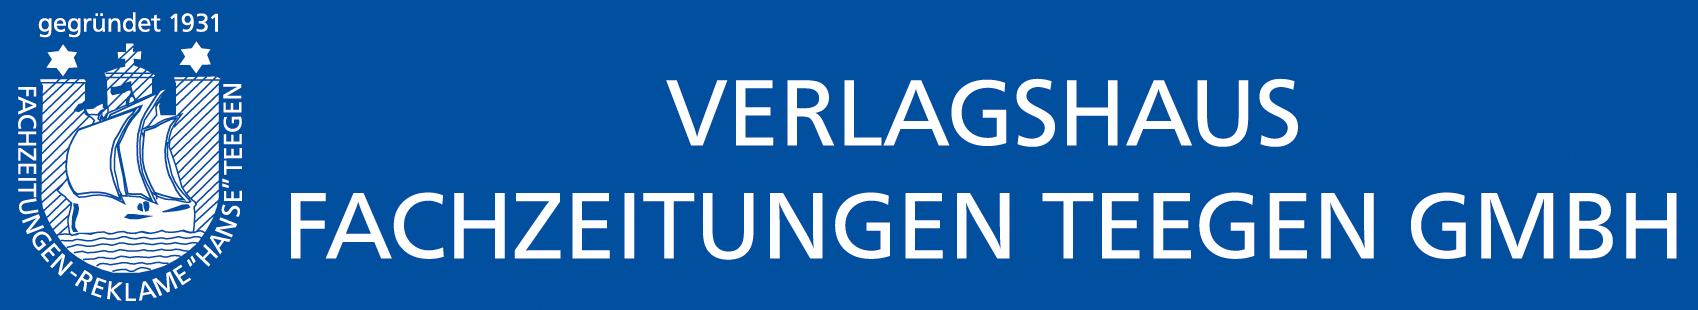 Verlagshaus Teegen